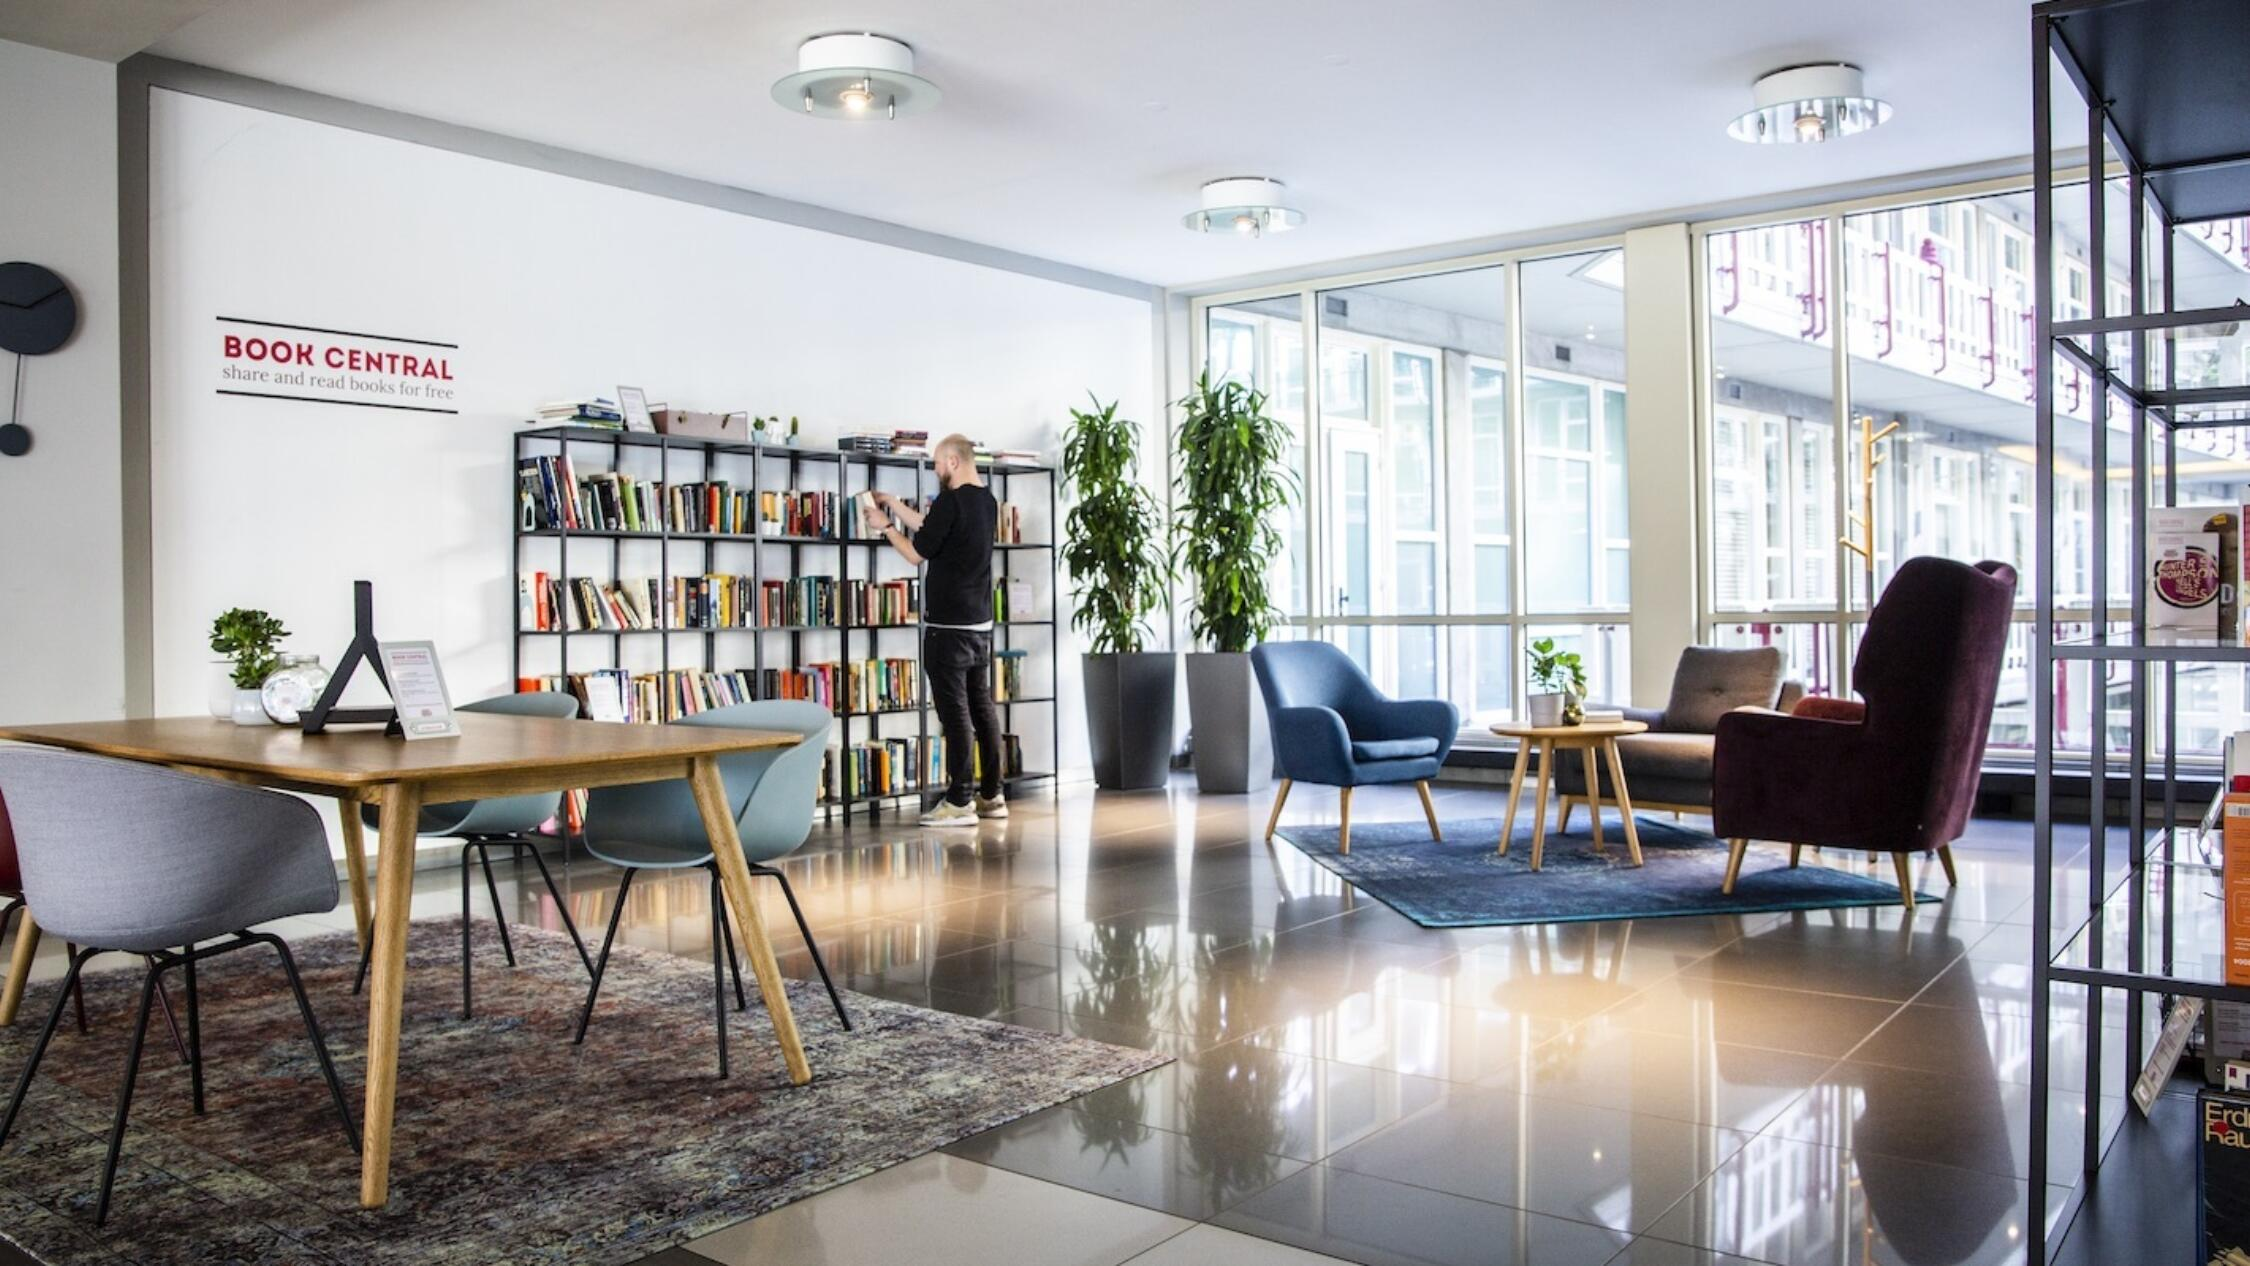 Groot Handelsgebouw interior common area with man browsing books on a shelf